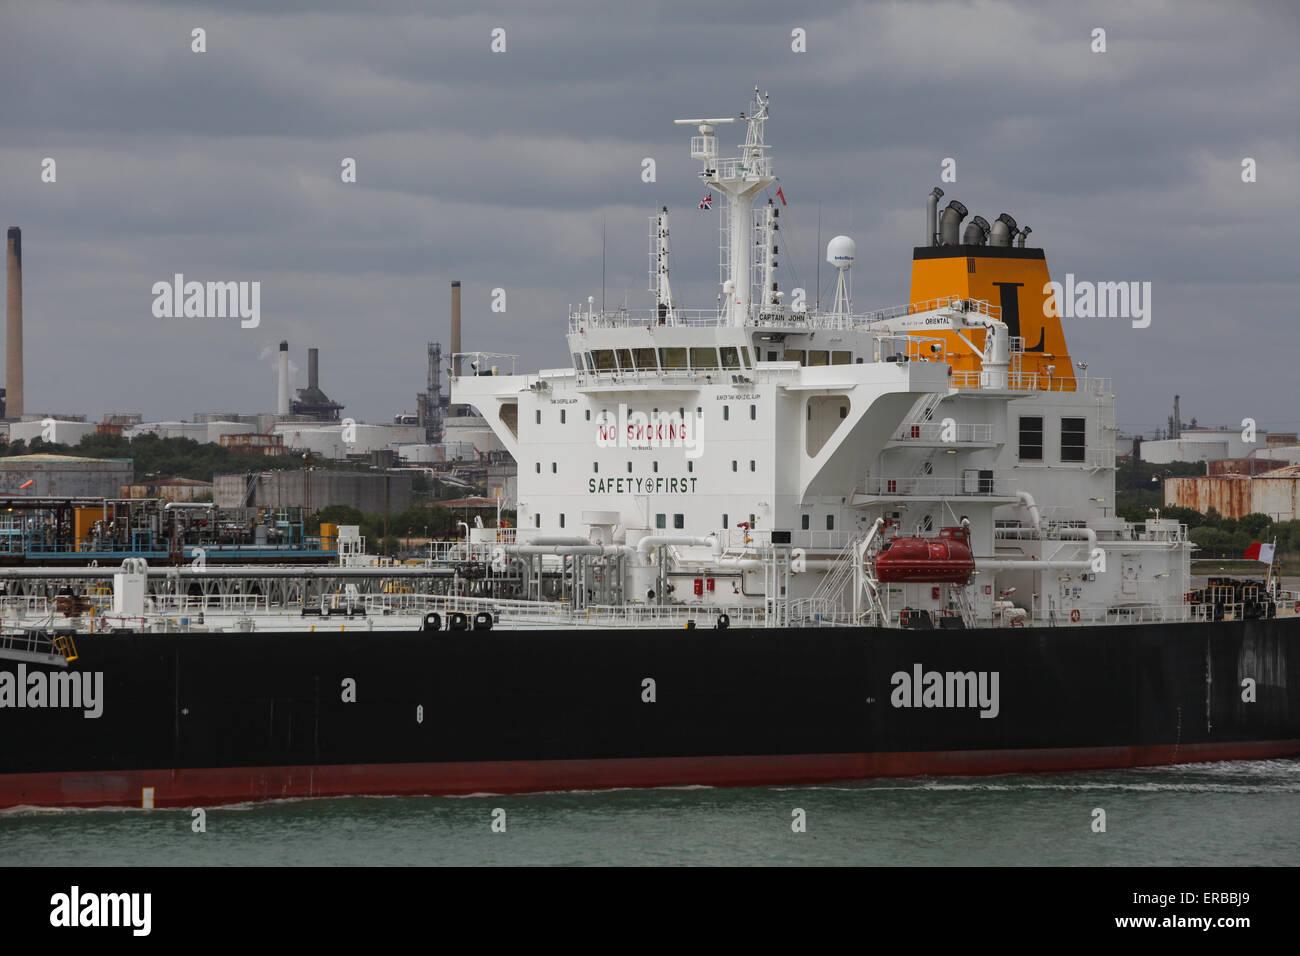 Captain John Oil tanker ship pictured at Fawley Refinery near Southampton UK - Stock Image